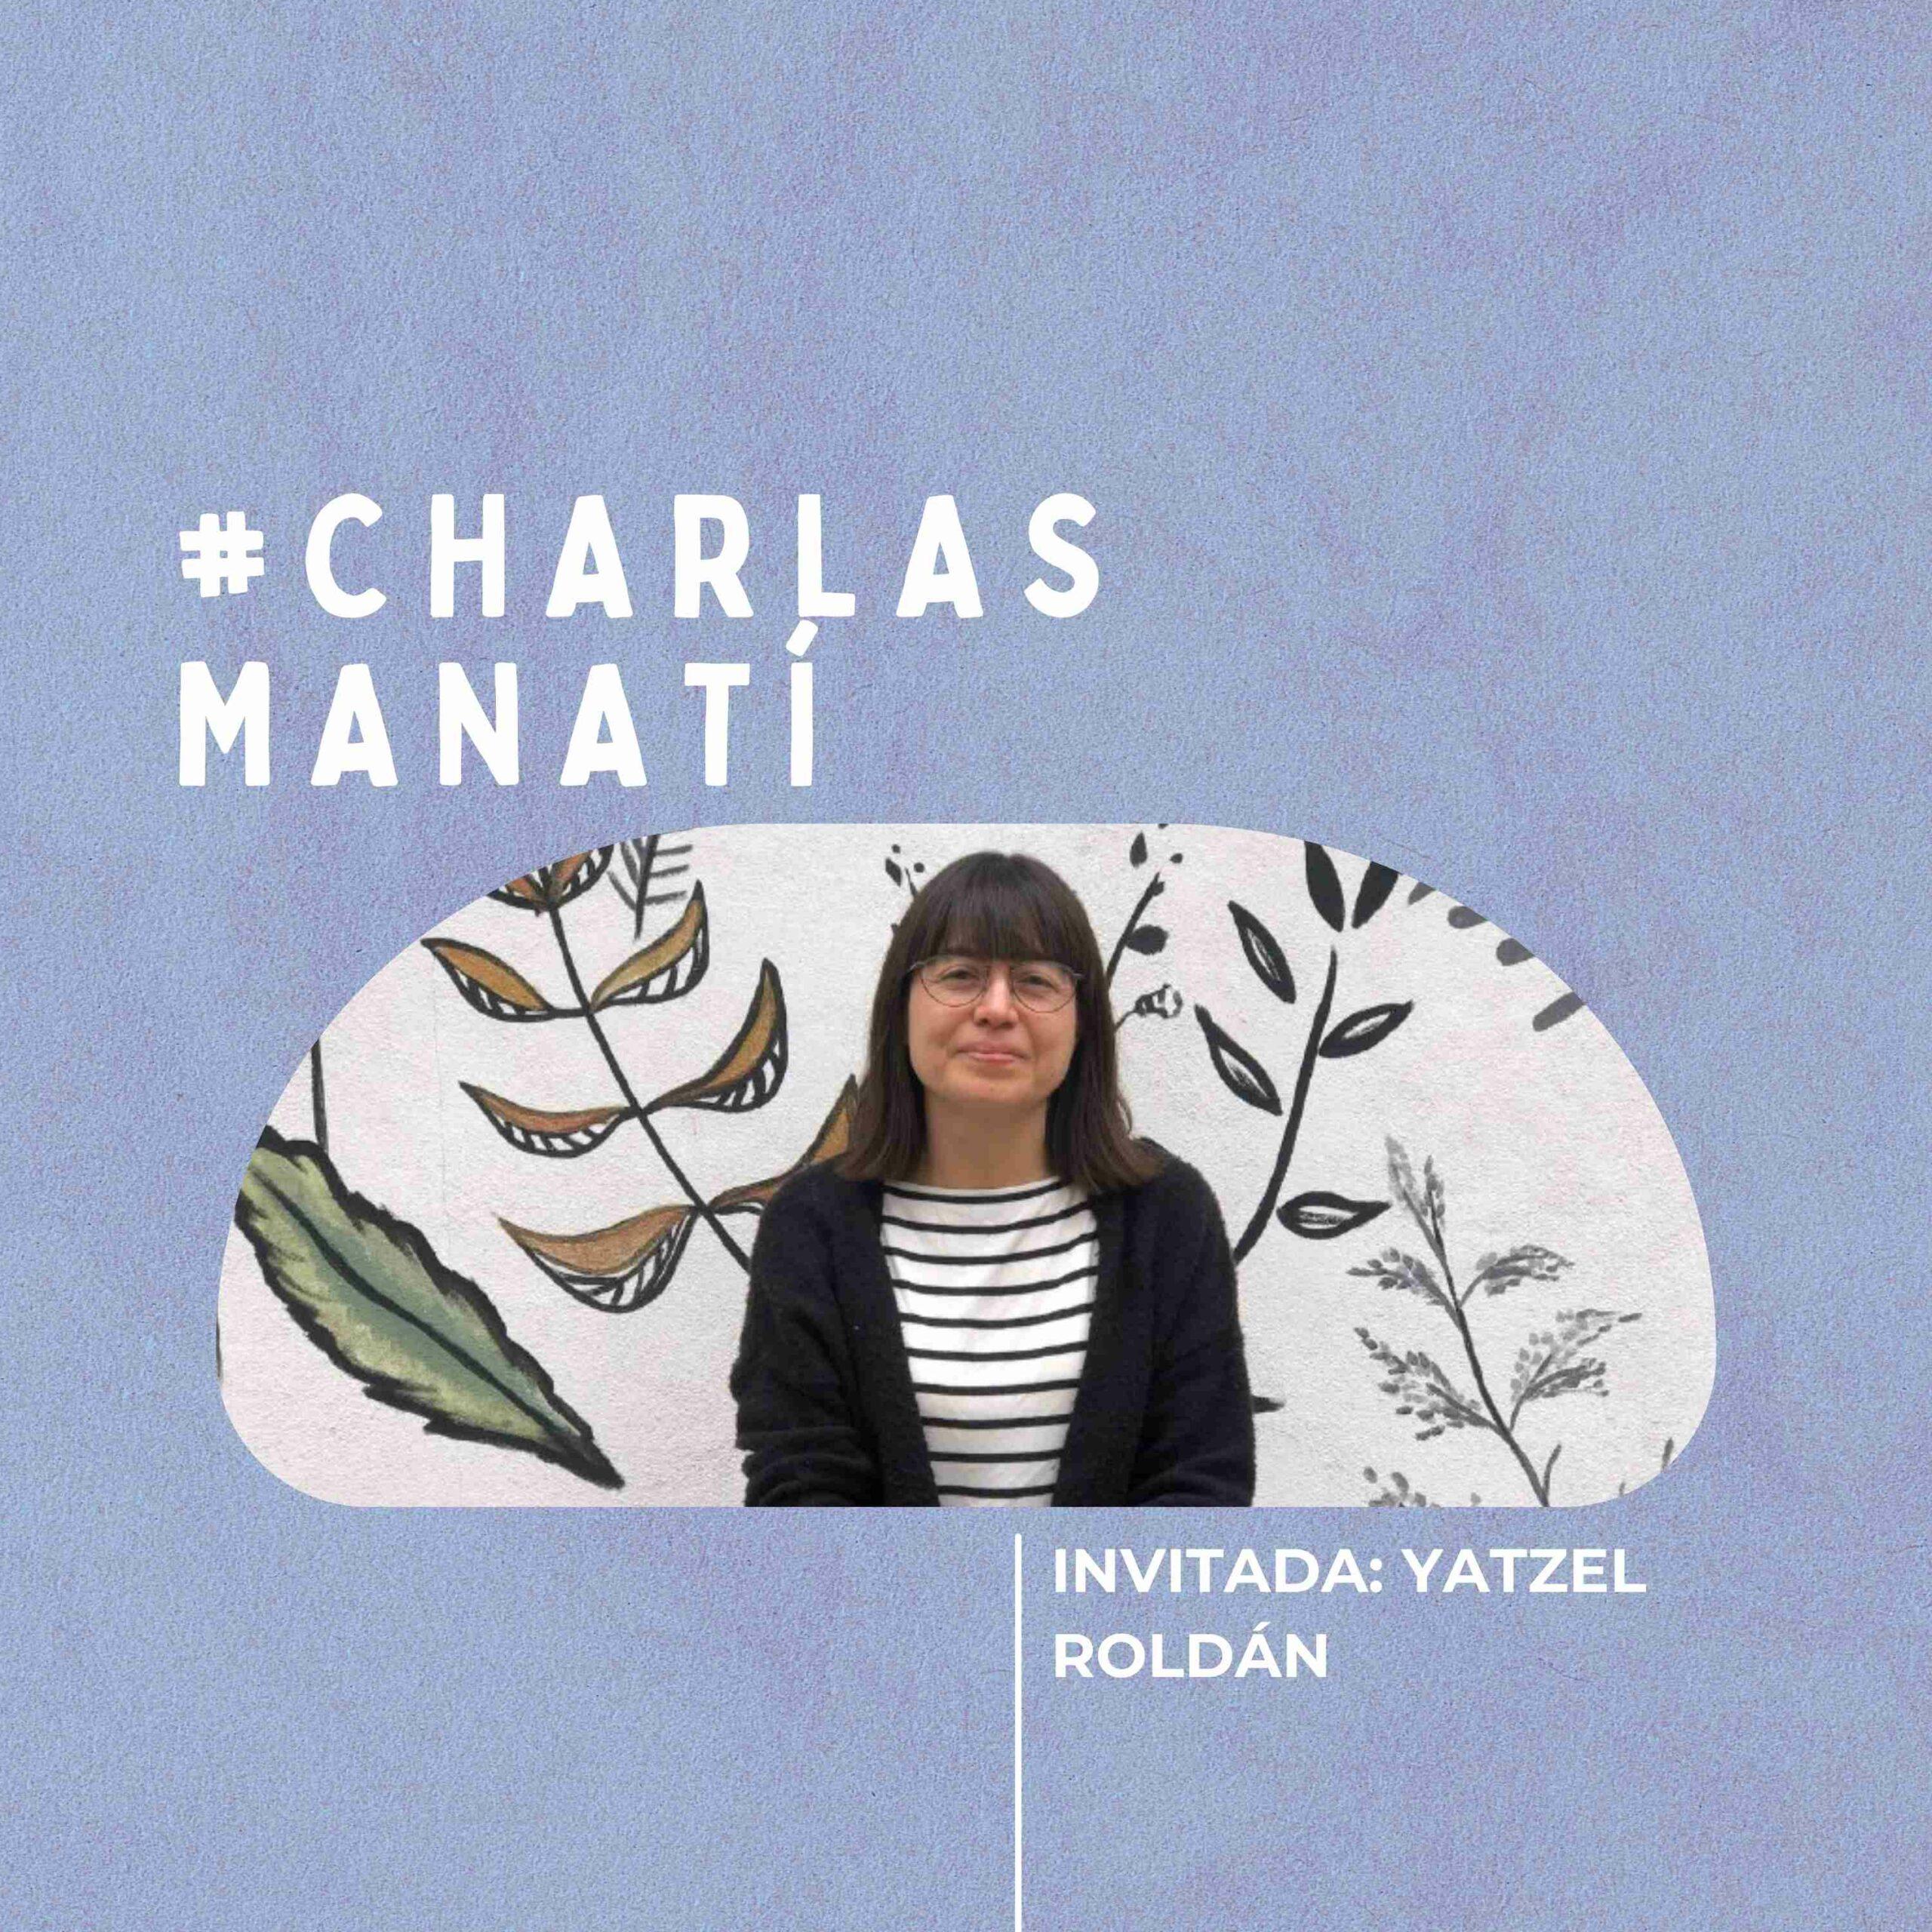 YATZEL ROLDAN_ charlas manatí